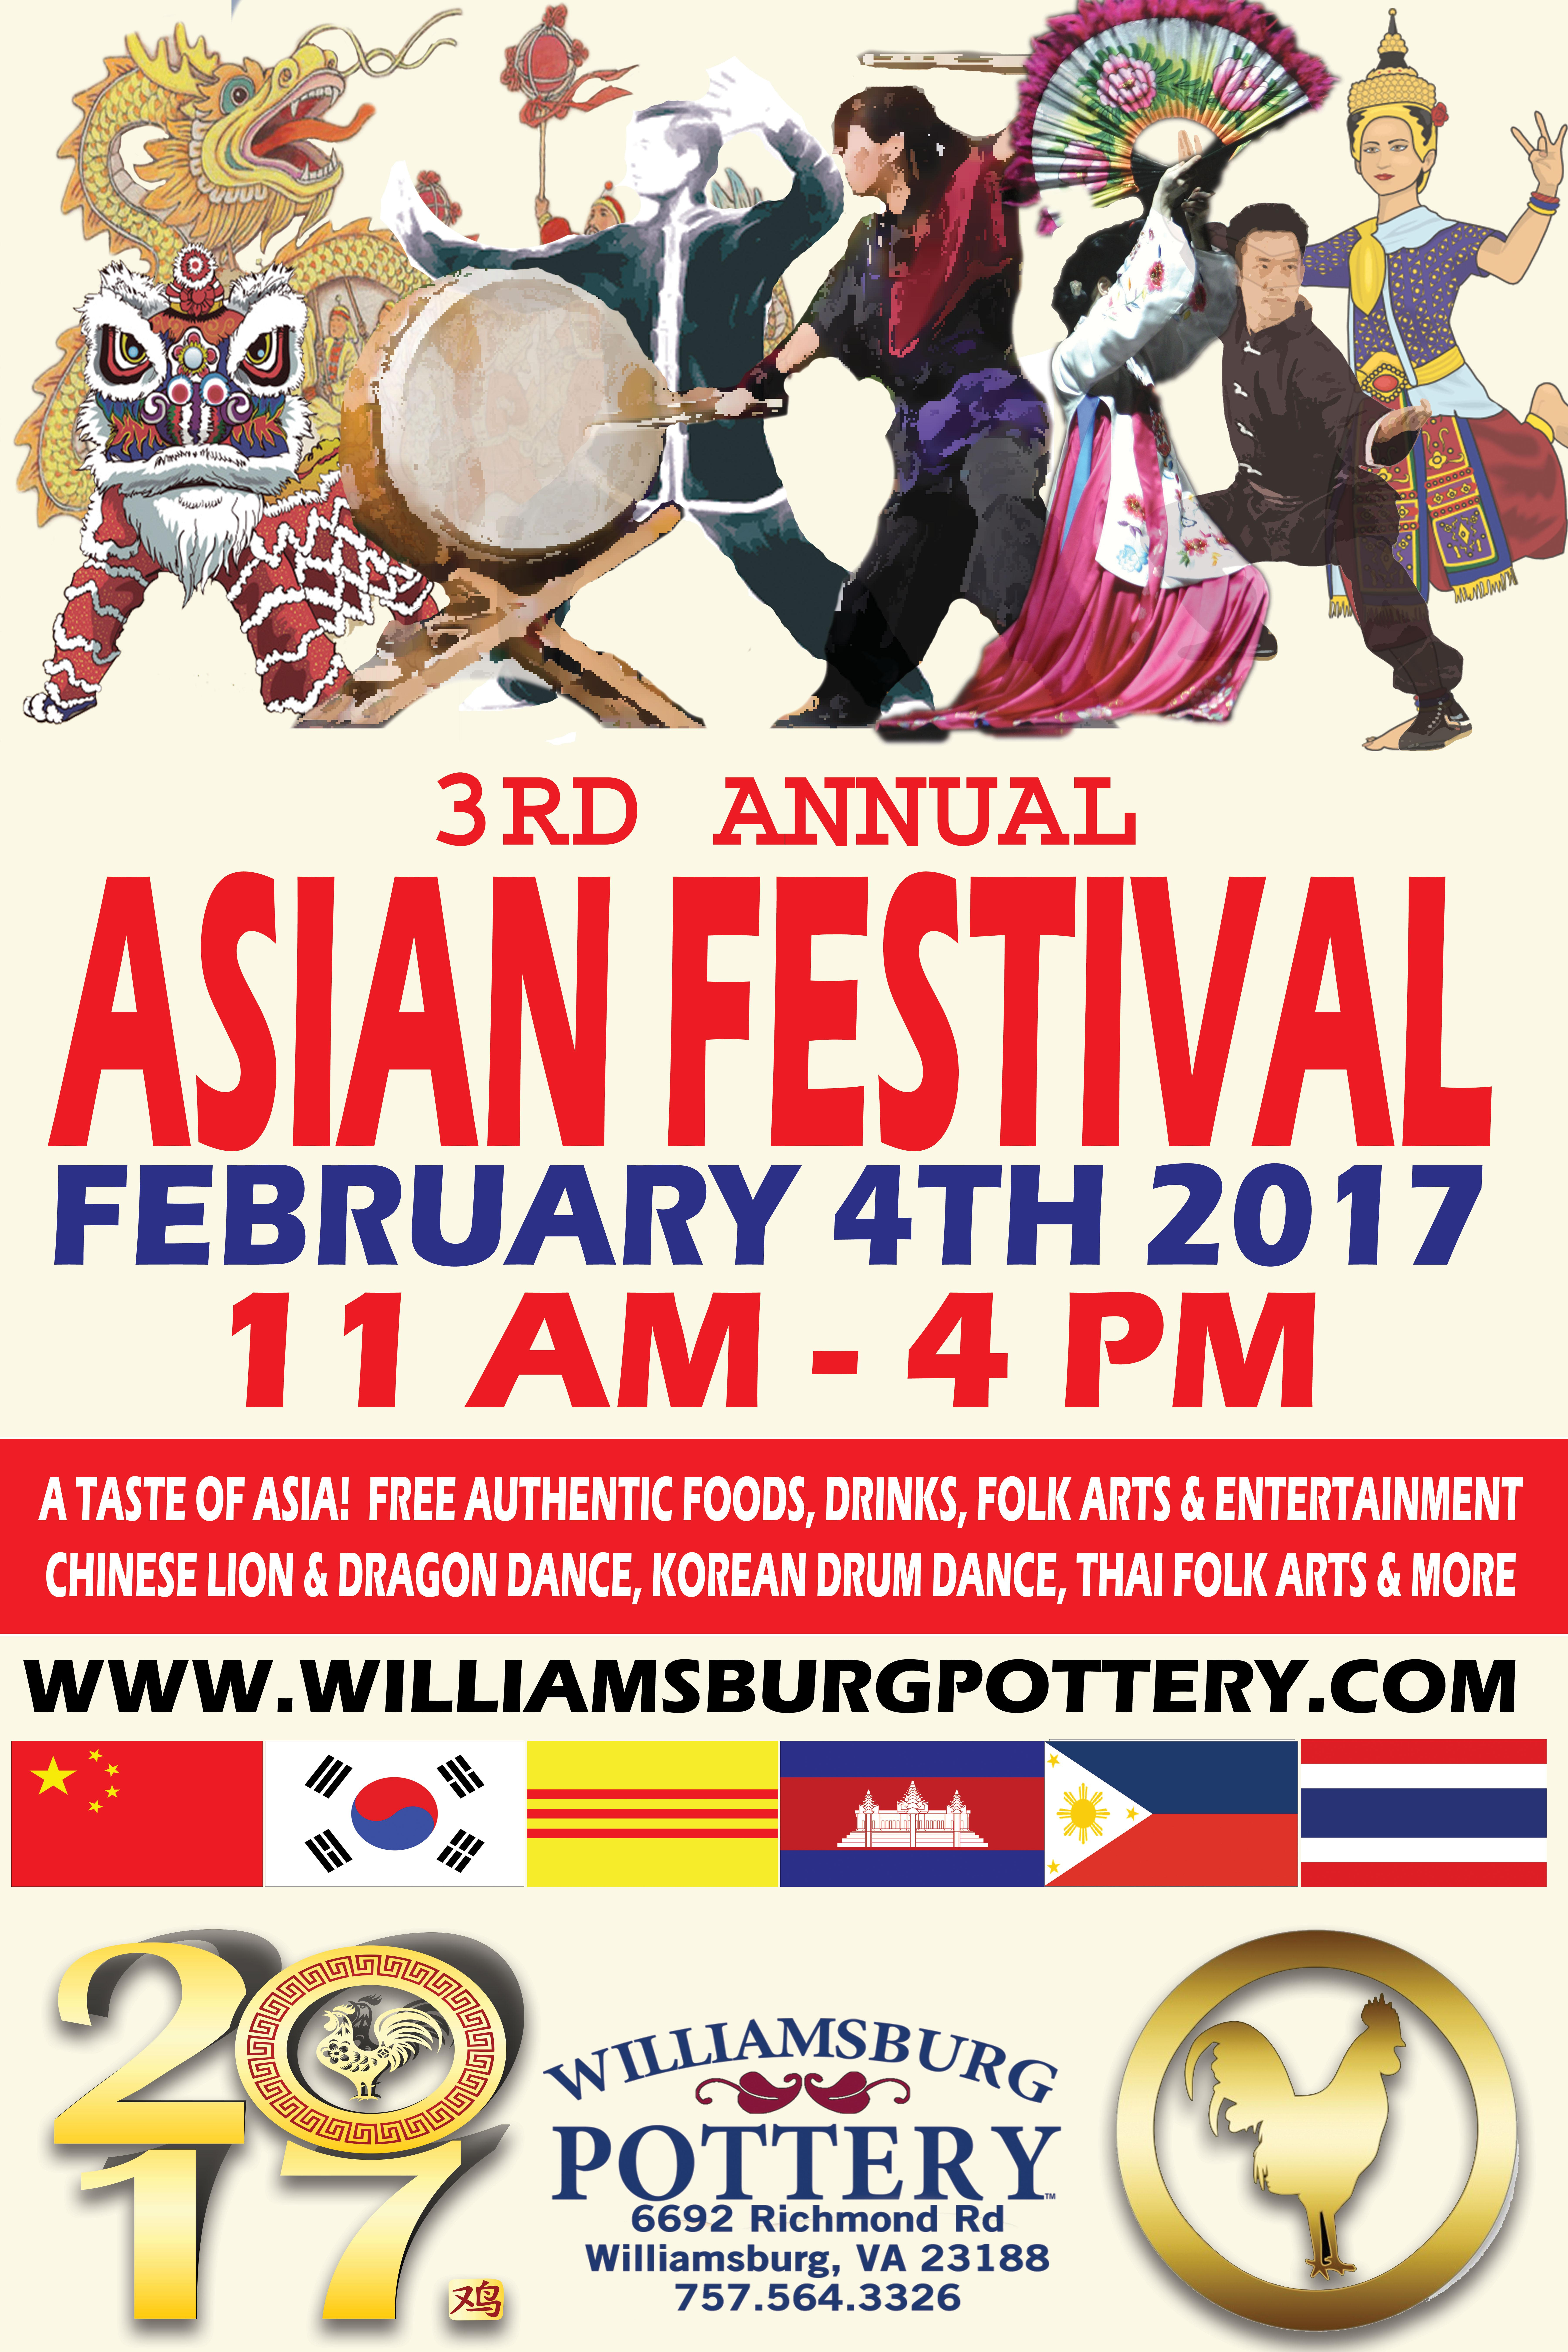 3rd Annual Asian Festival